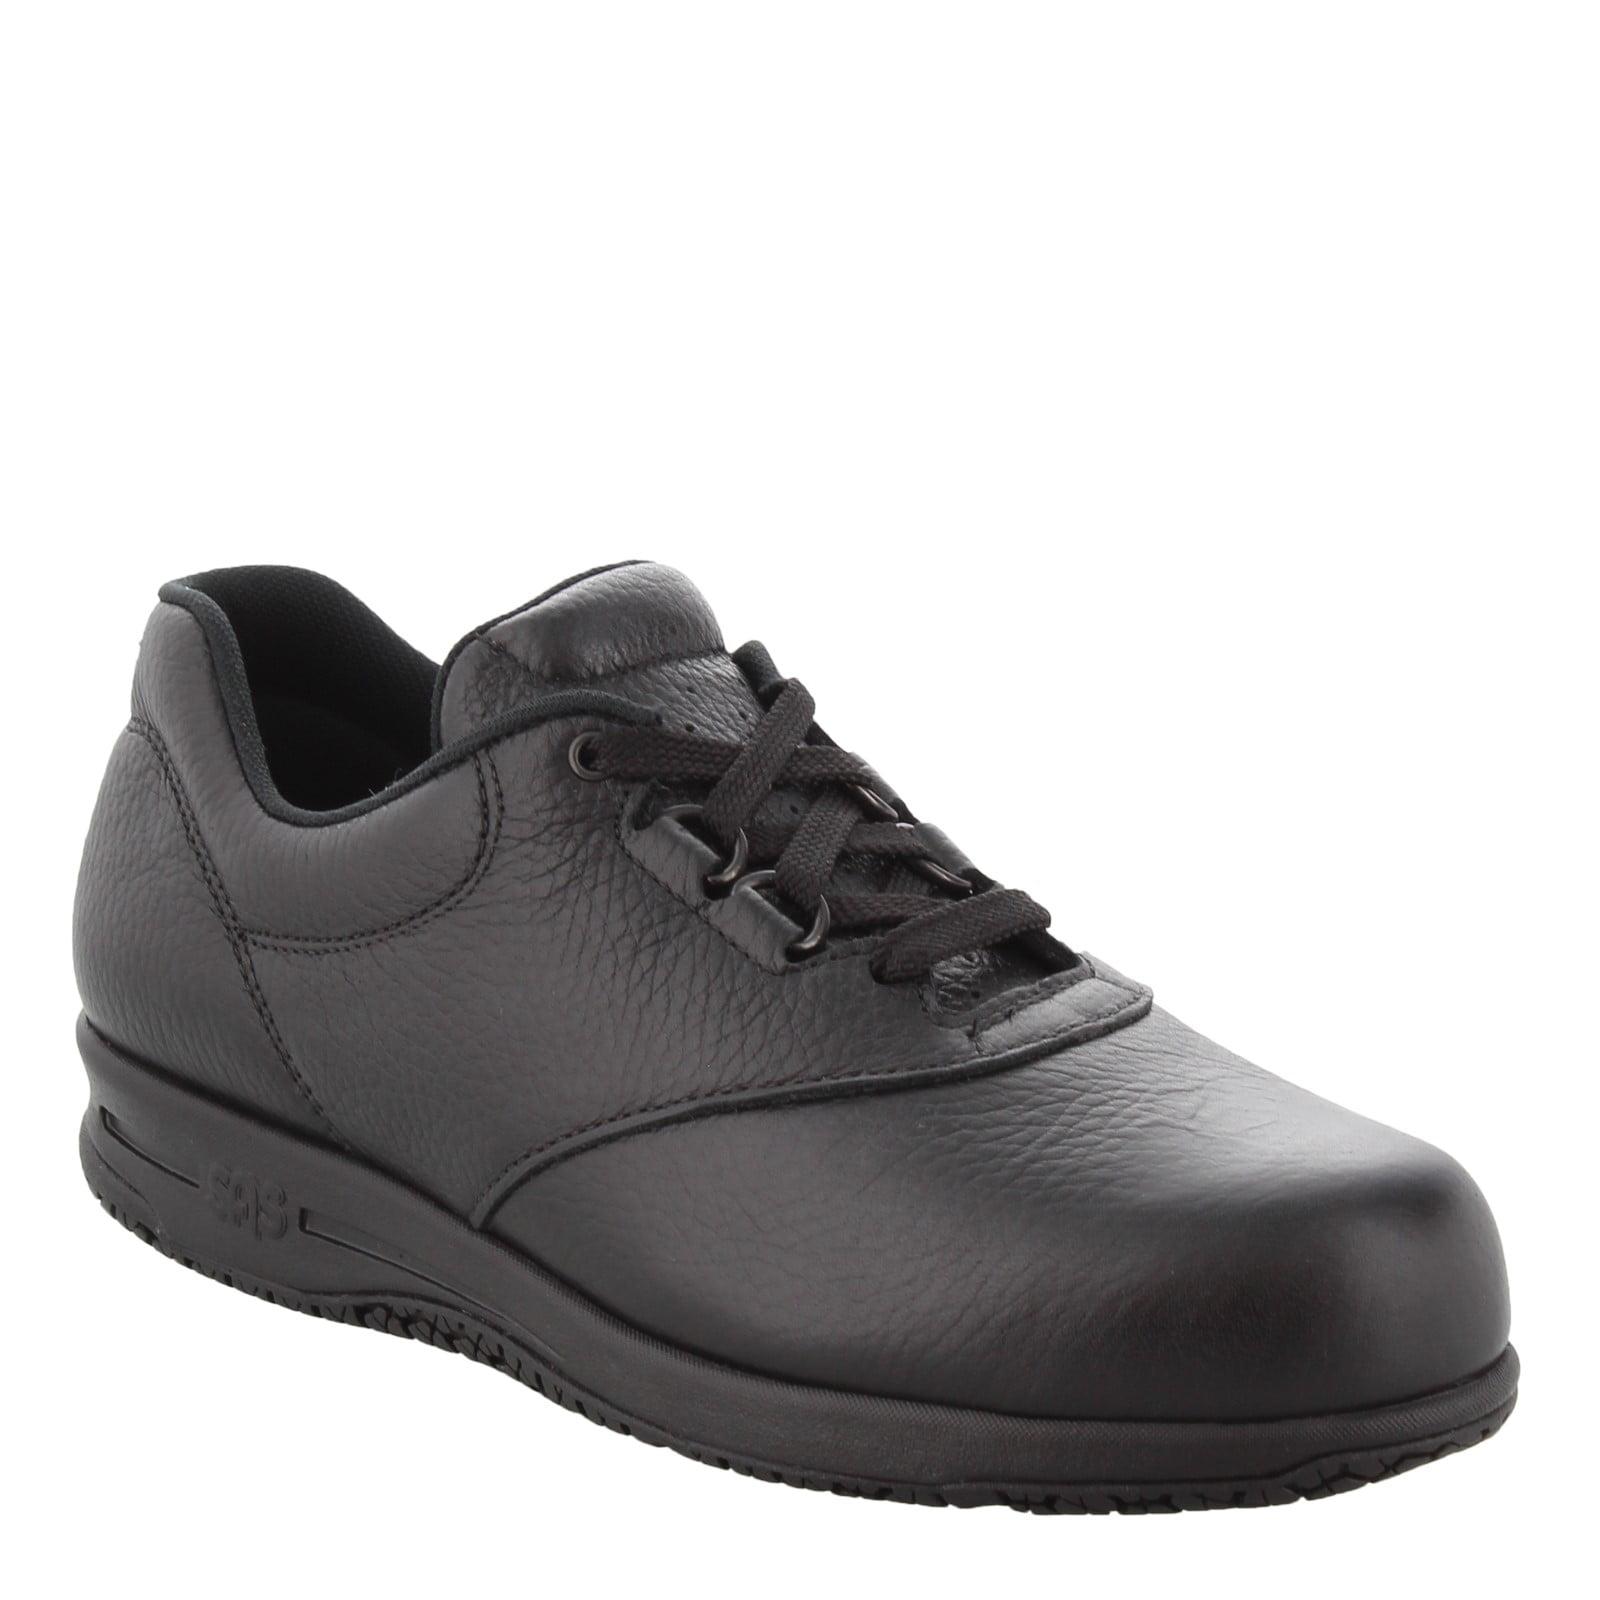 SAS, Liberty Non Slip Sneaker - Walmart